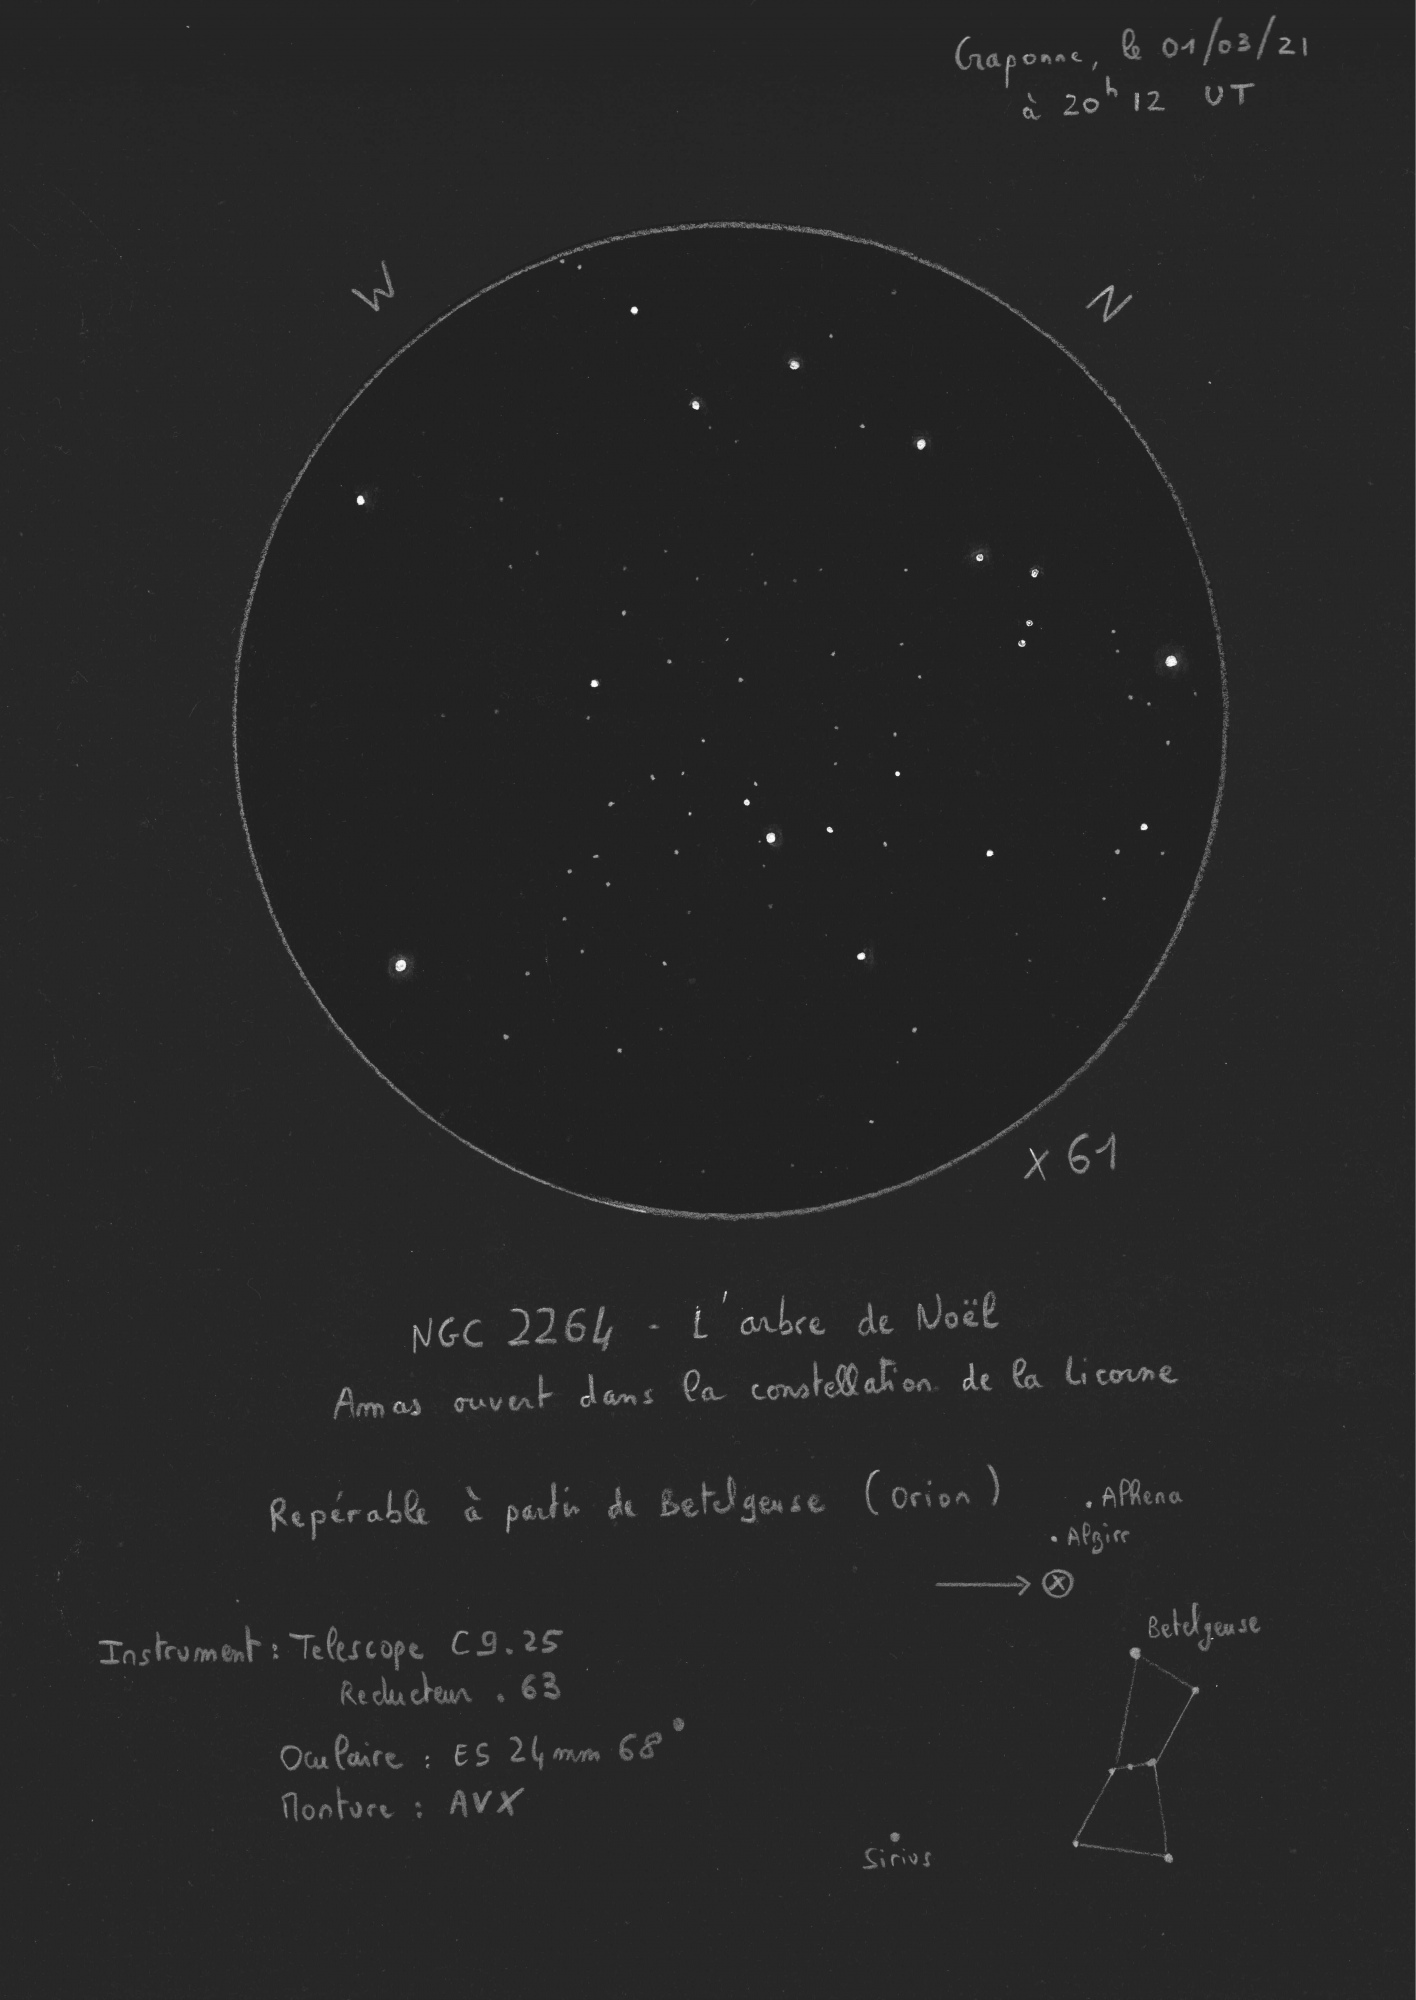 6050ebb9cc445_NGC2264.thumb.jpg.c8a2986ac82ff75dd87ae66f6955981e.jpg